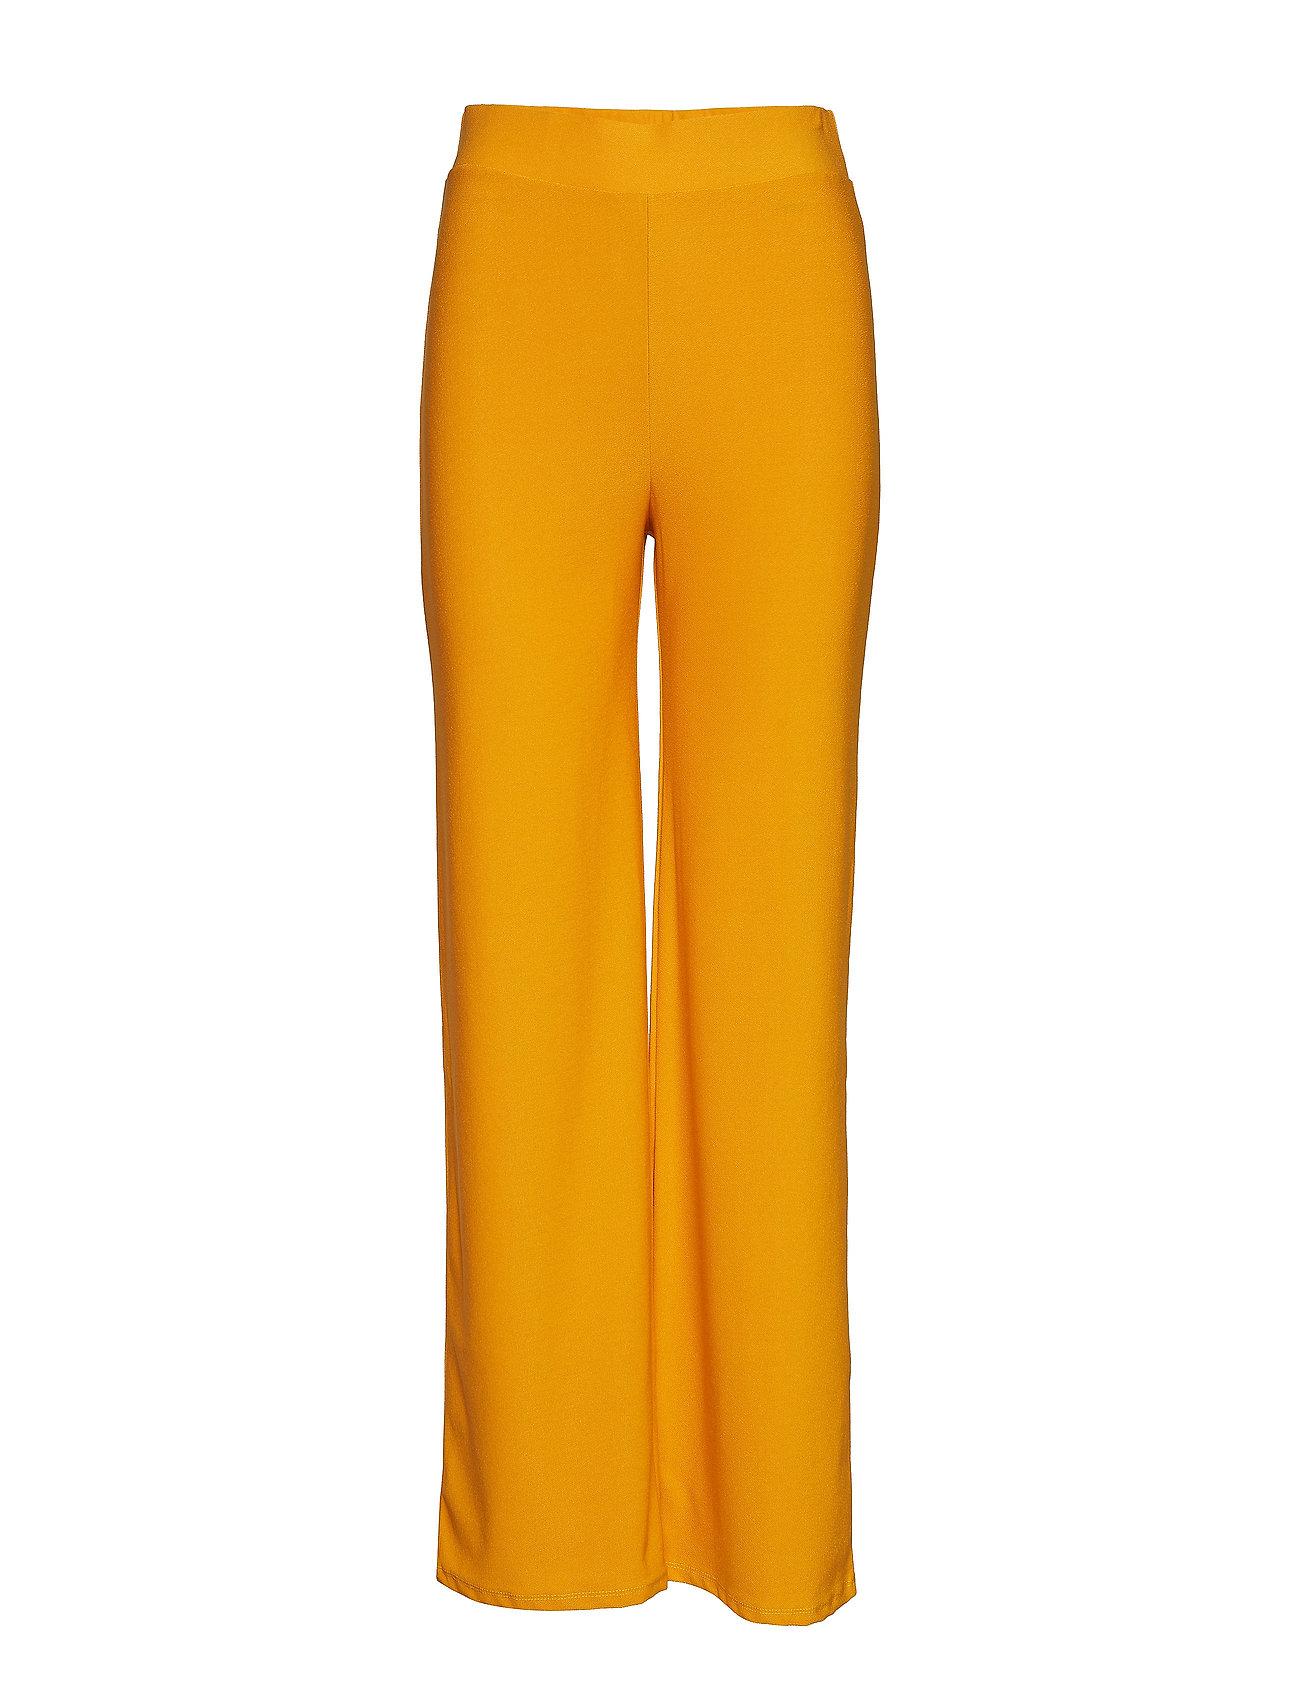 226fecf0a0f Gul Gina Tricot Maya Trousers bukser for dame - Pashion.dk